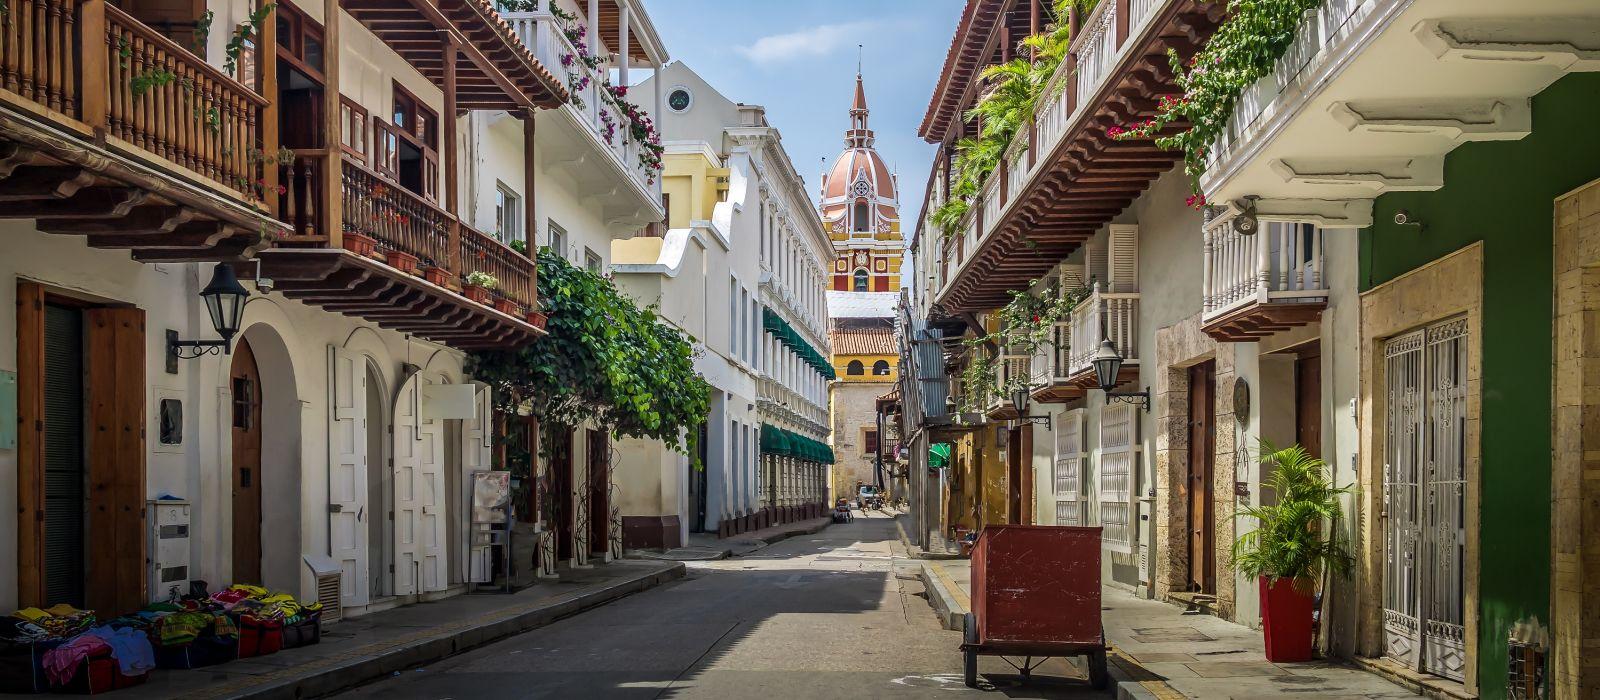 Kolumbien: Cartagena, Kaffeeregion & Isla Baru Urlaub 2